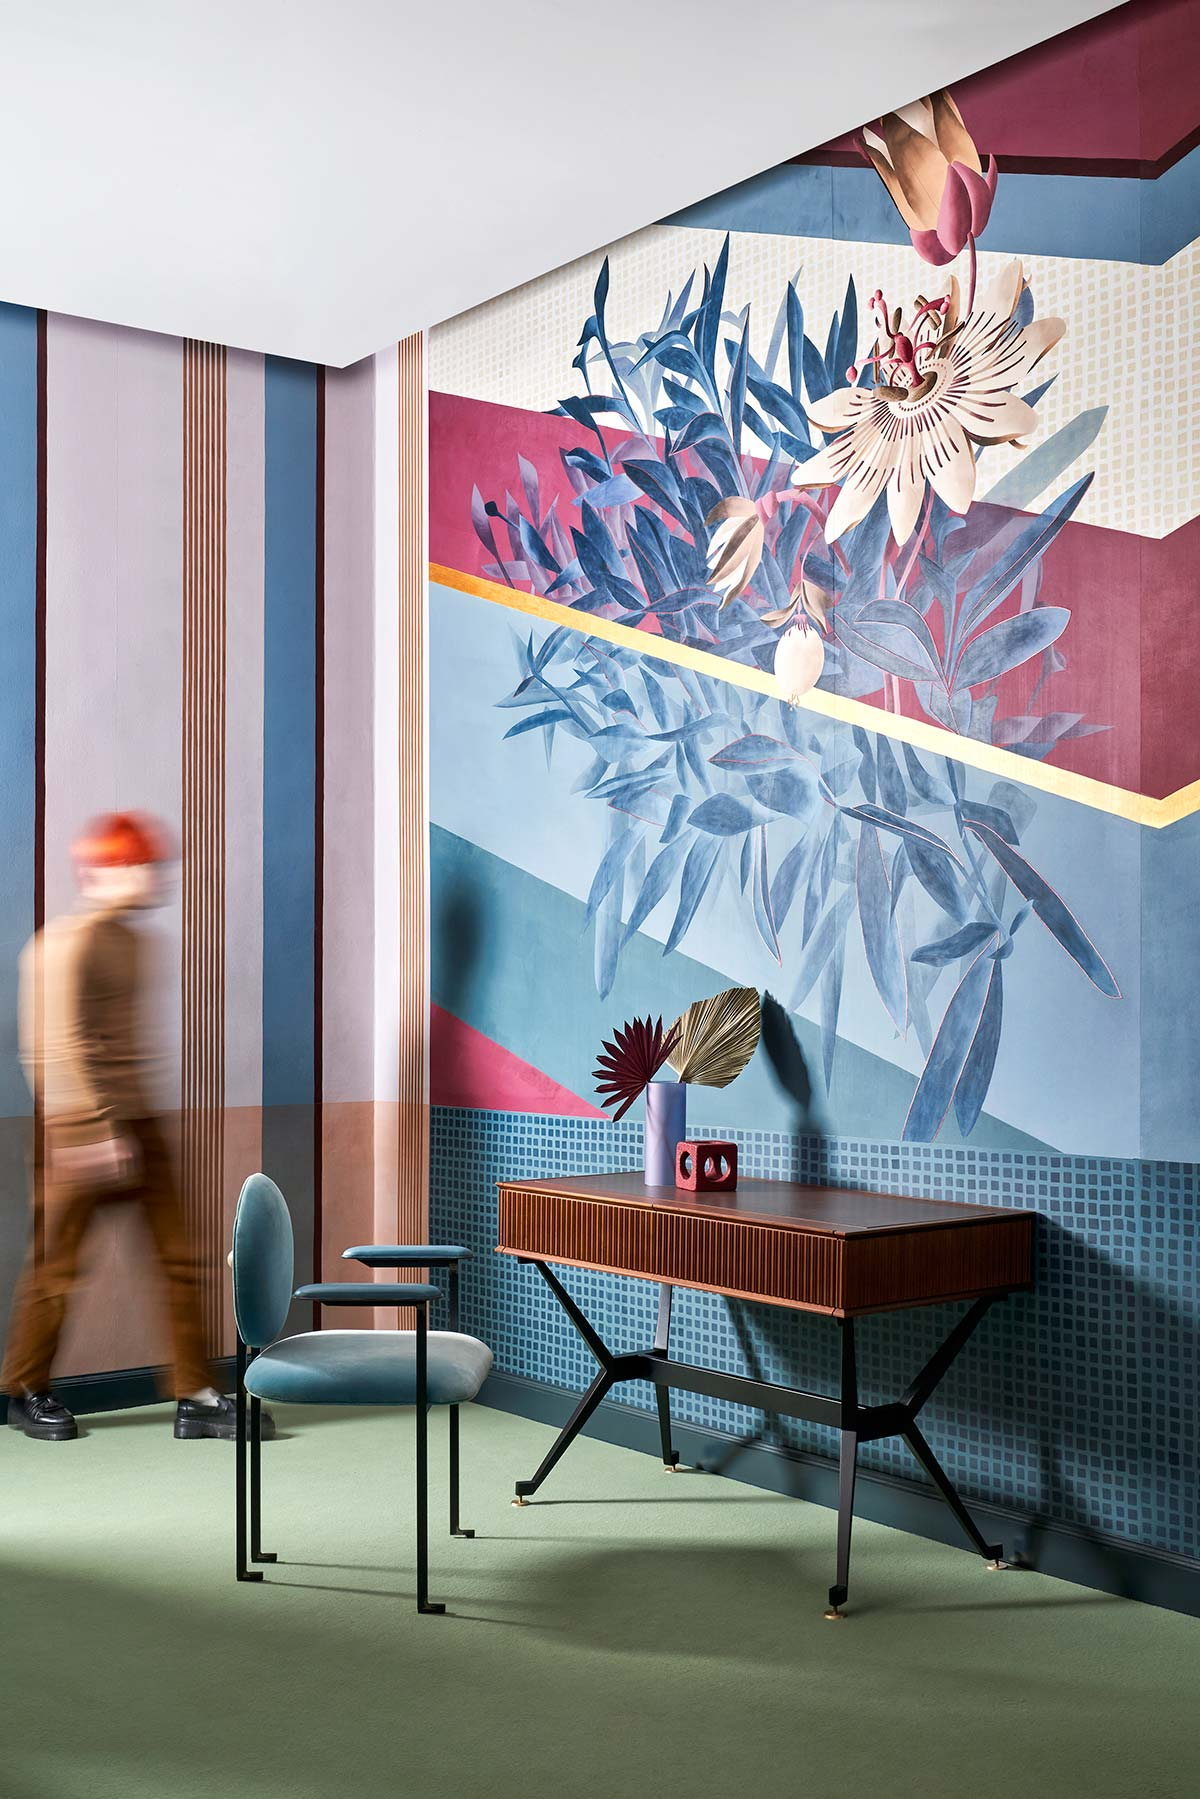 Misha Showroom Milano. Passiflora wallpaper, desk D-ITA, seduta Mario Milana MM3. Photo © Davide Lovatti, Stylist Studio Salaris